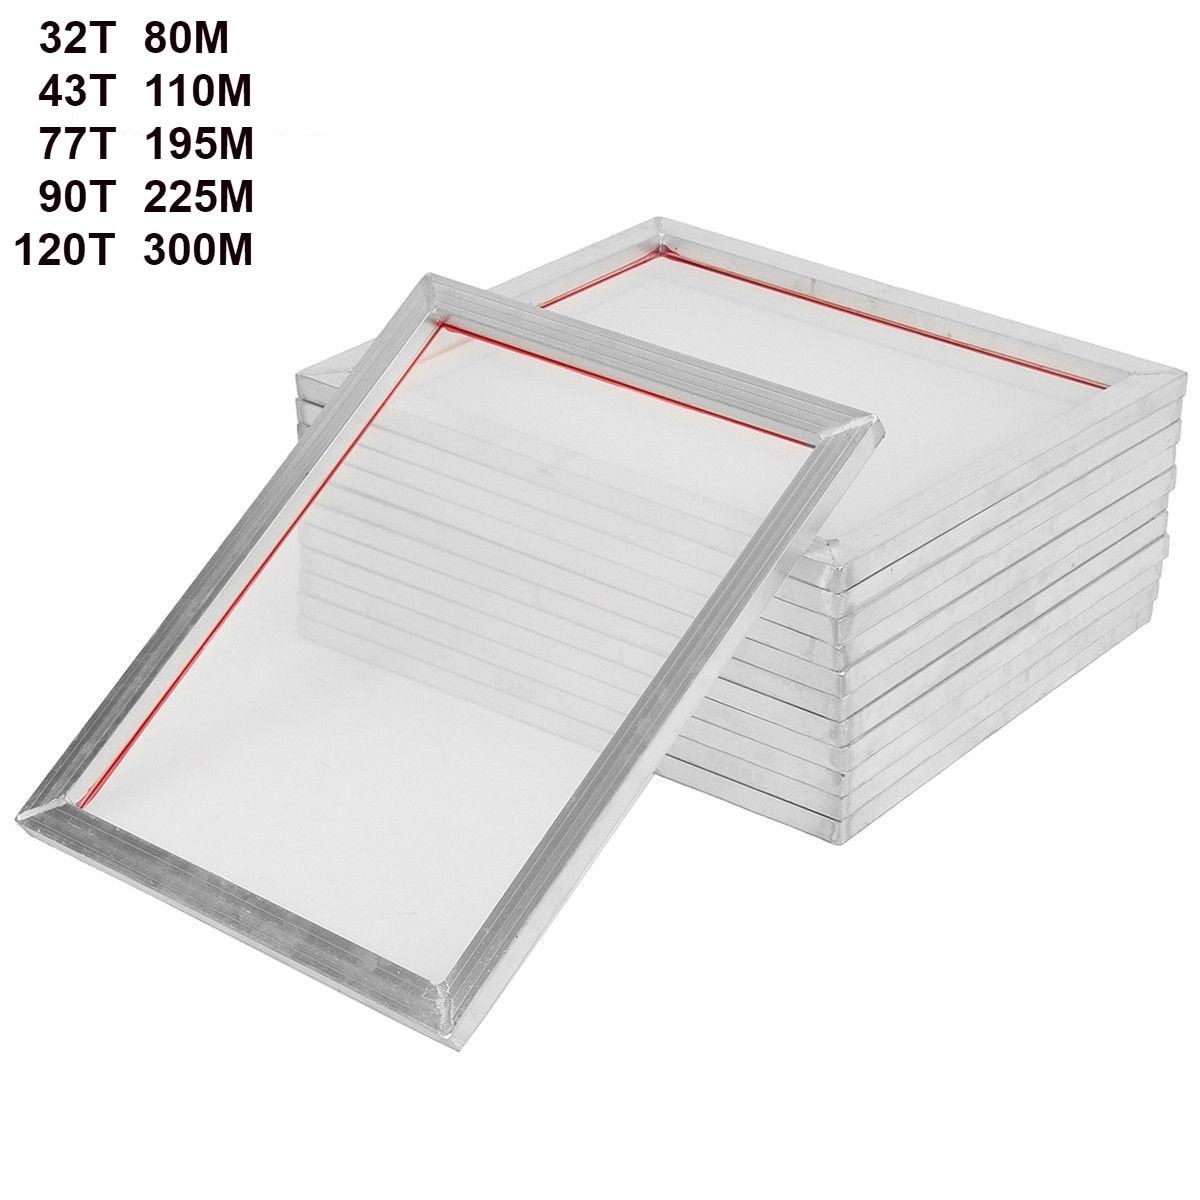 5Pack 46cm*41cm Aluminum Silk Screen Printing Press Frame 18'' X16'' Screens 32T 43T 77T 90T 120T White Polyester Mesh 40cm*35cm